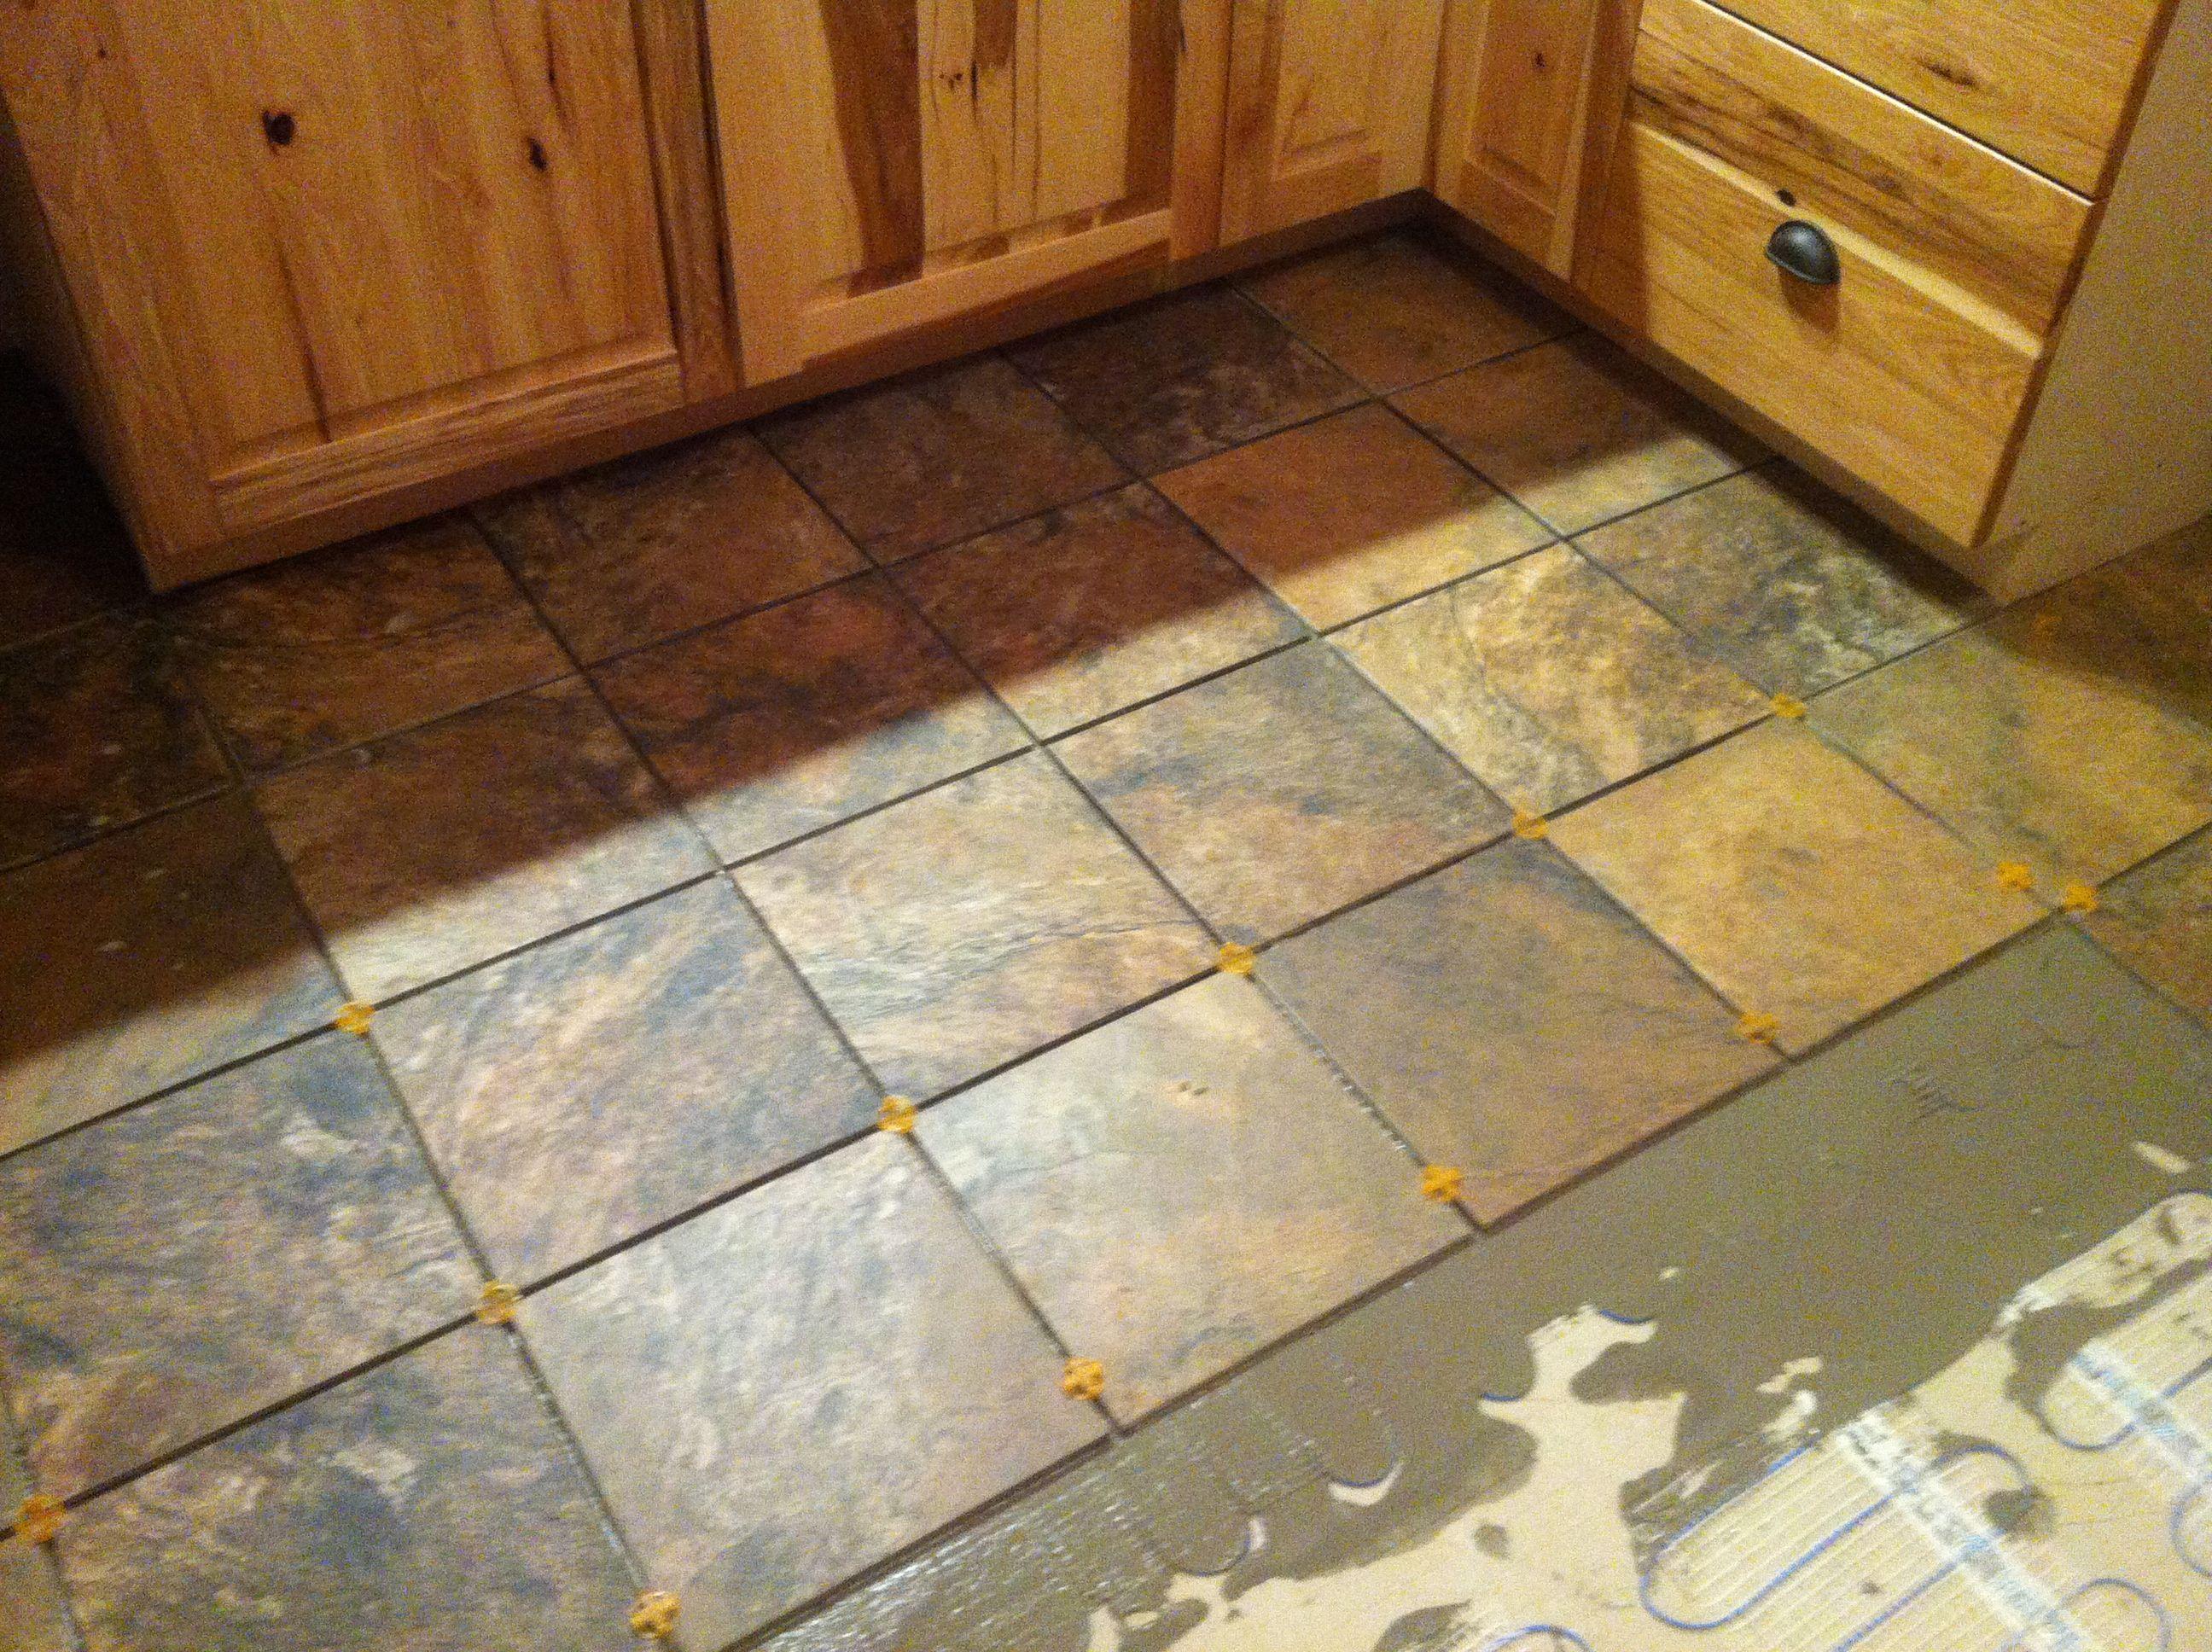 heated bathroom tiles. Heated Bathroom Floor Under Tile With Well-made Laticrete 3\u2032 X 5\u2032, Tiles E